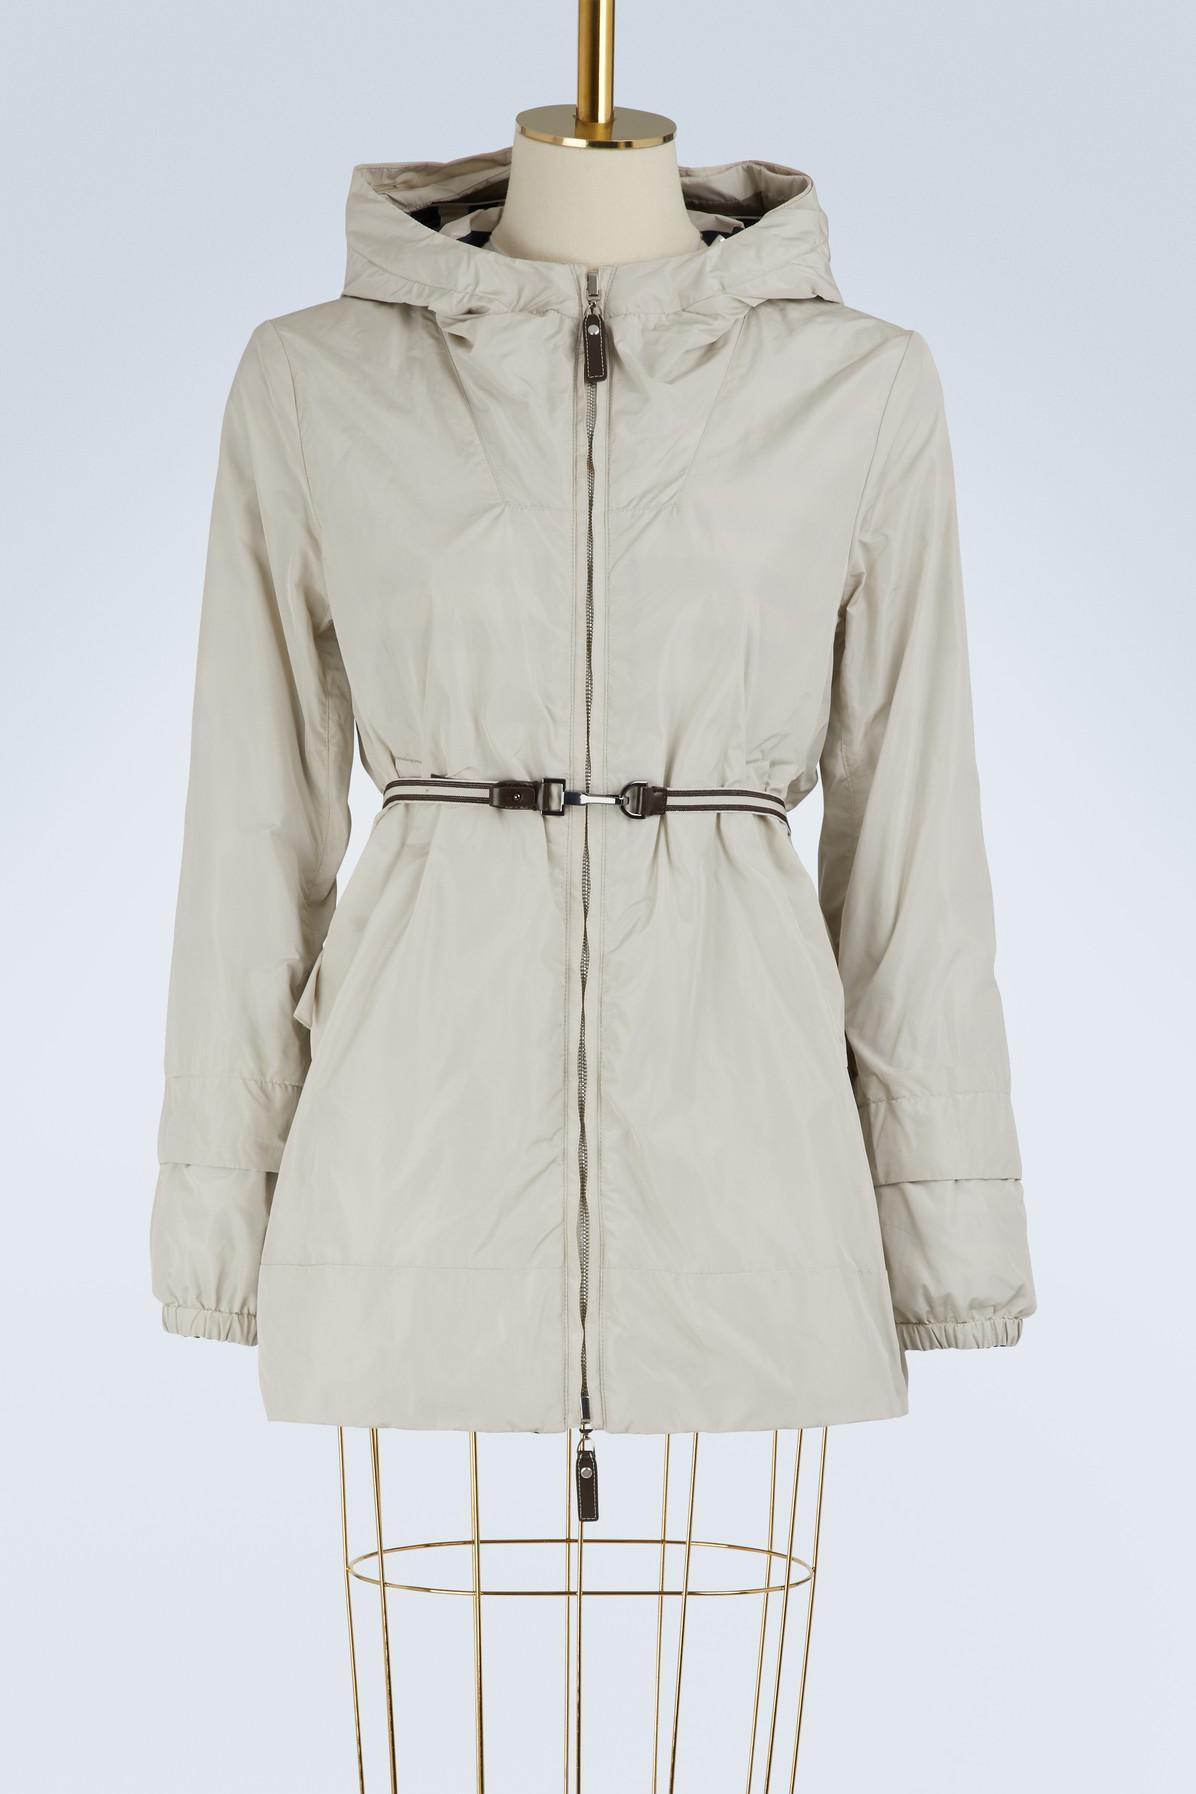 Cheap Sale Very Cheap Latest Collections Sale Online Lightr raincoat Max Mara Free Shipping Supply Nek9CiHTnT